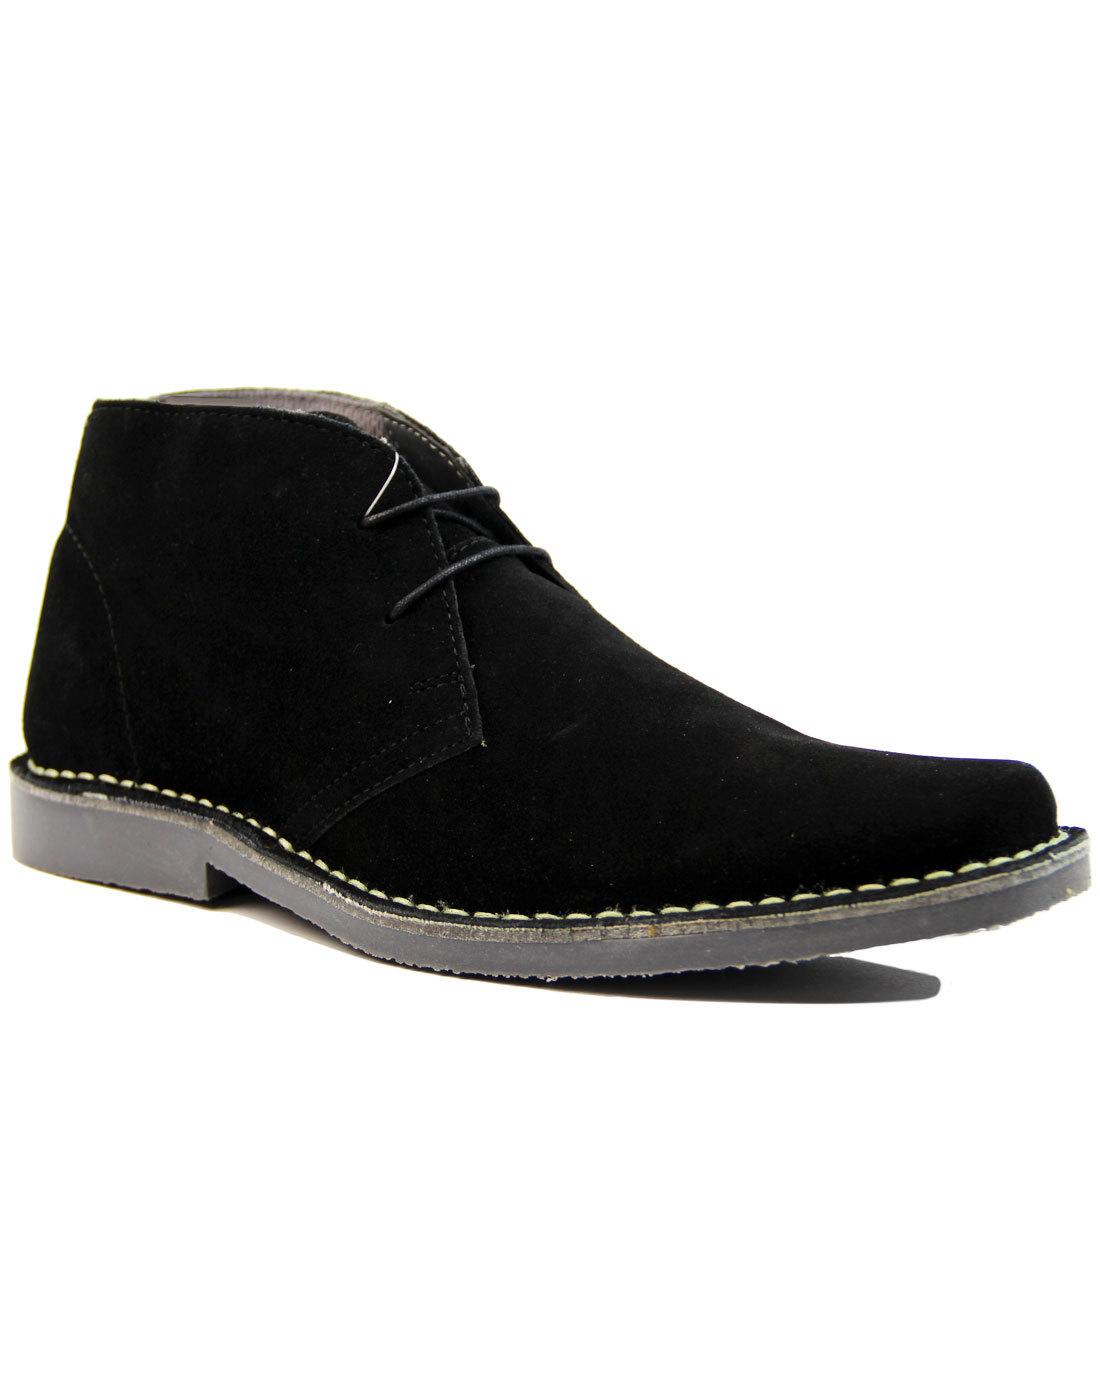 Double Dekker - Mens Mod Suede Desert Boots BLACK